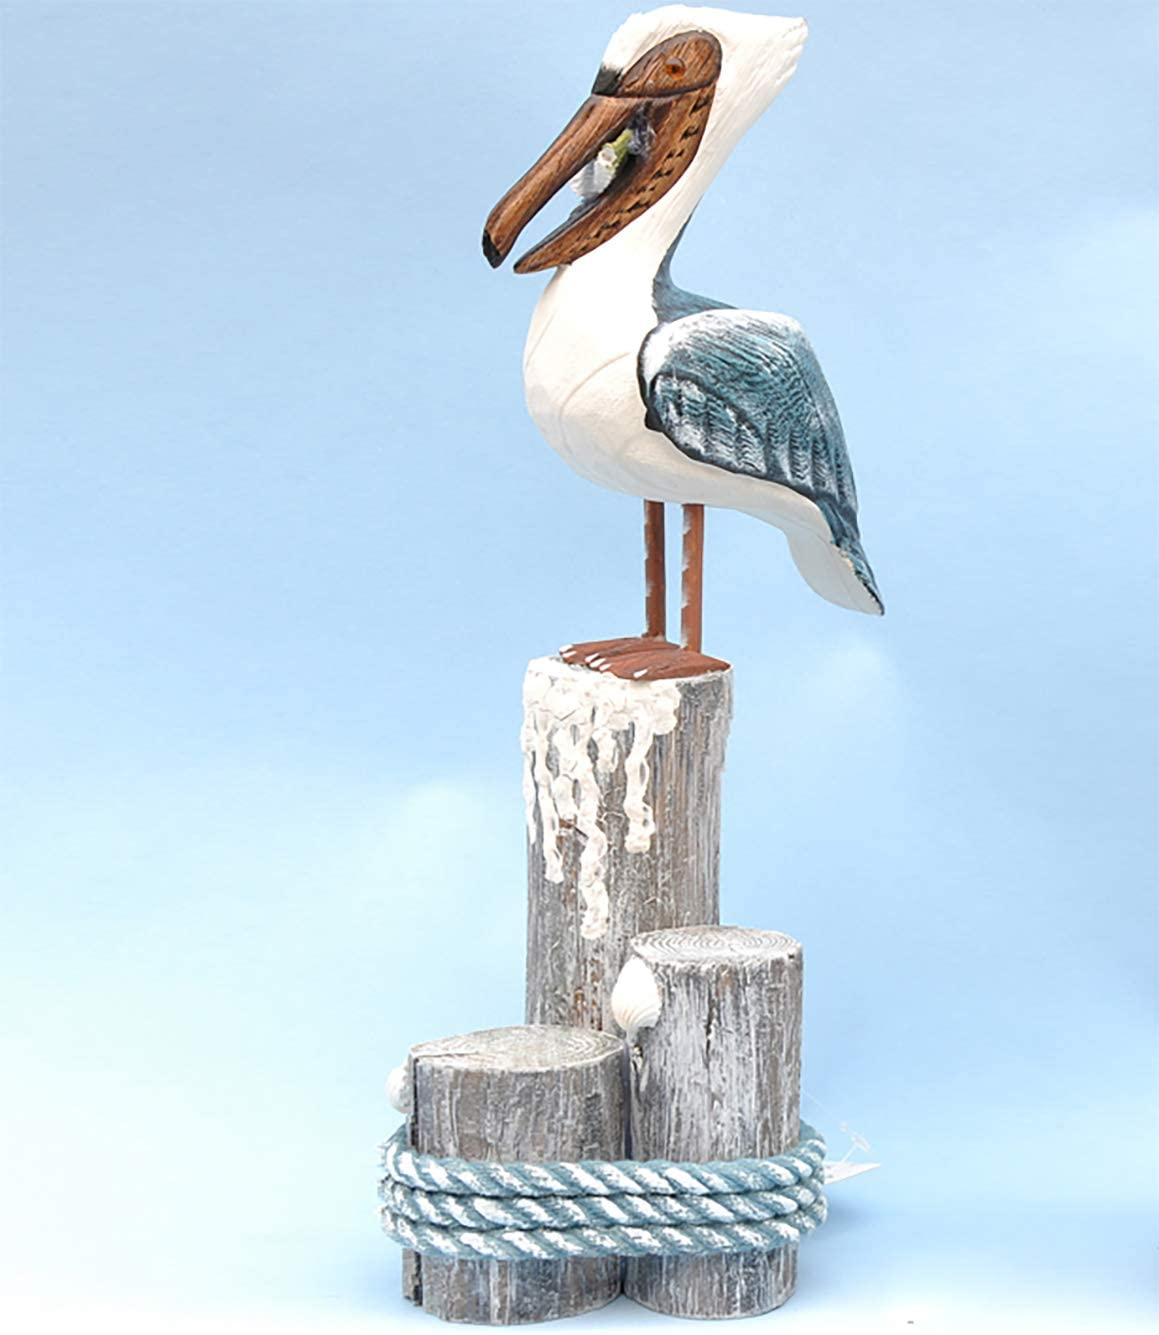 SAMEMO Wooden Pelicans Coastal Beach Home Decorations Figurine Nautical Decorations Ornaments Rustic Vintage Indoor Décor Nautical Gifts